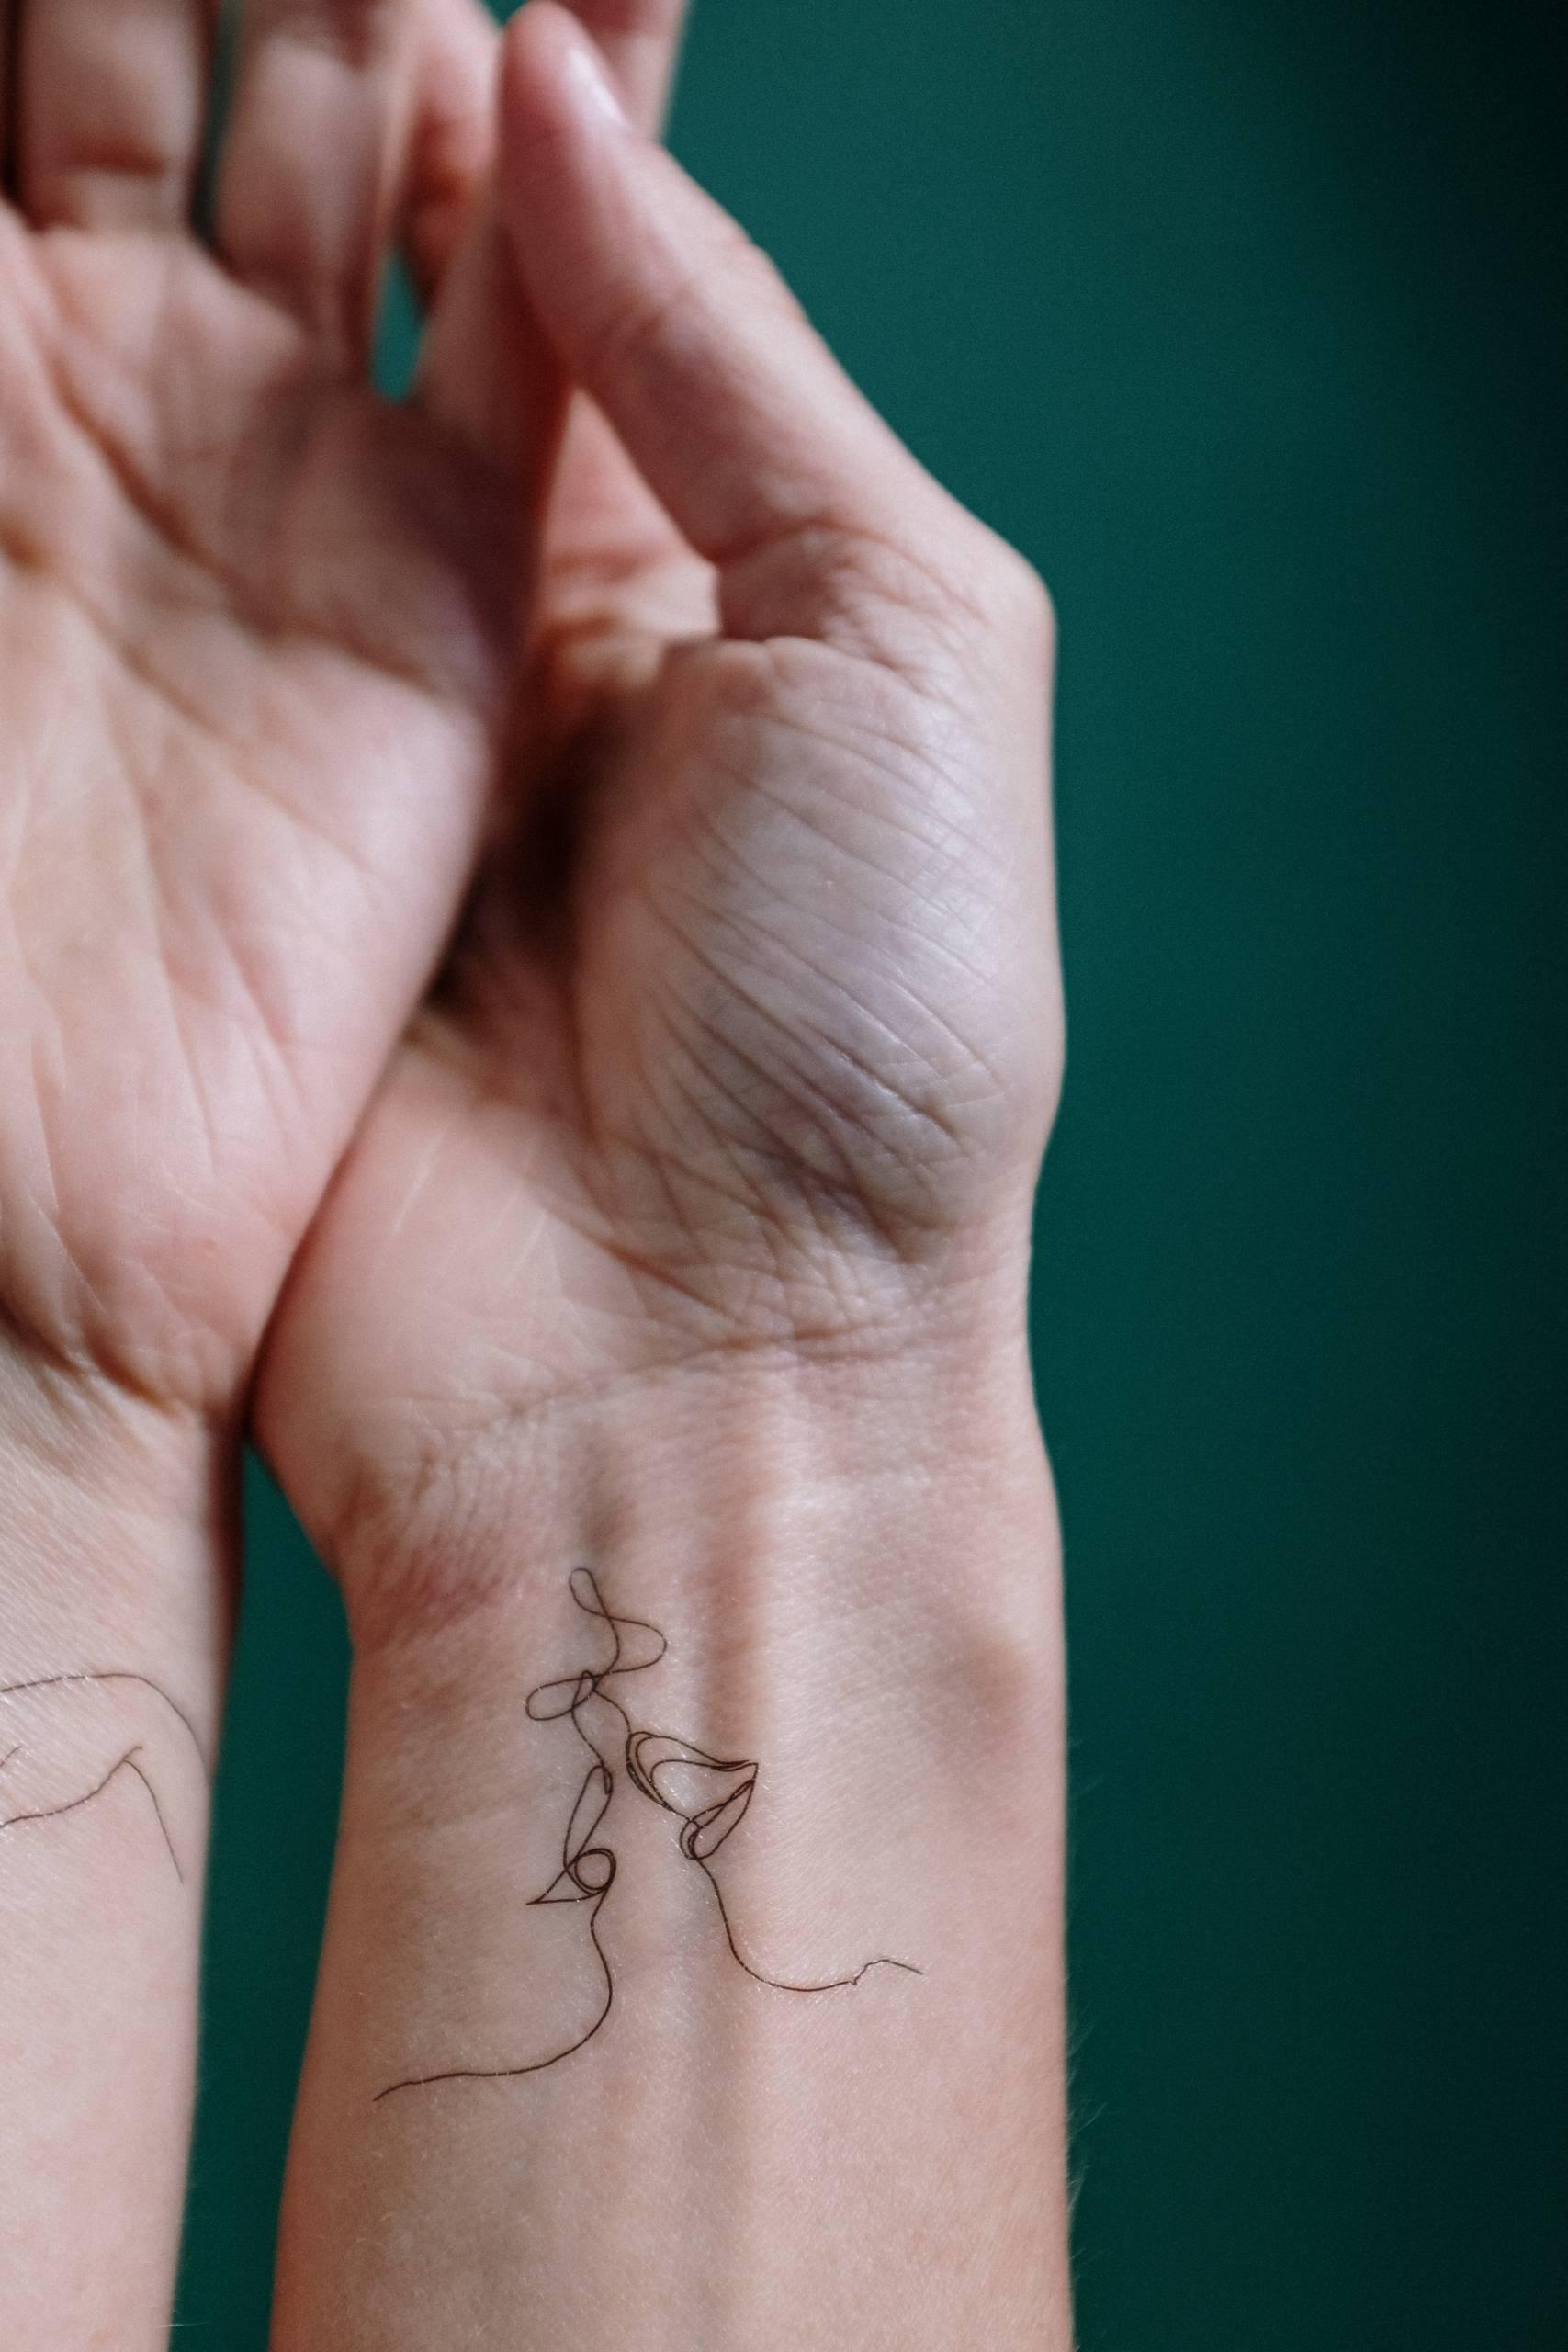 Woman's wrists